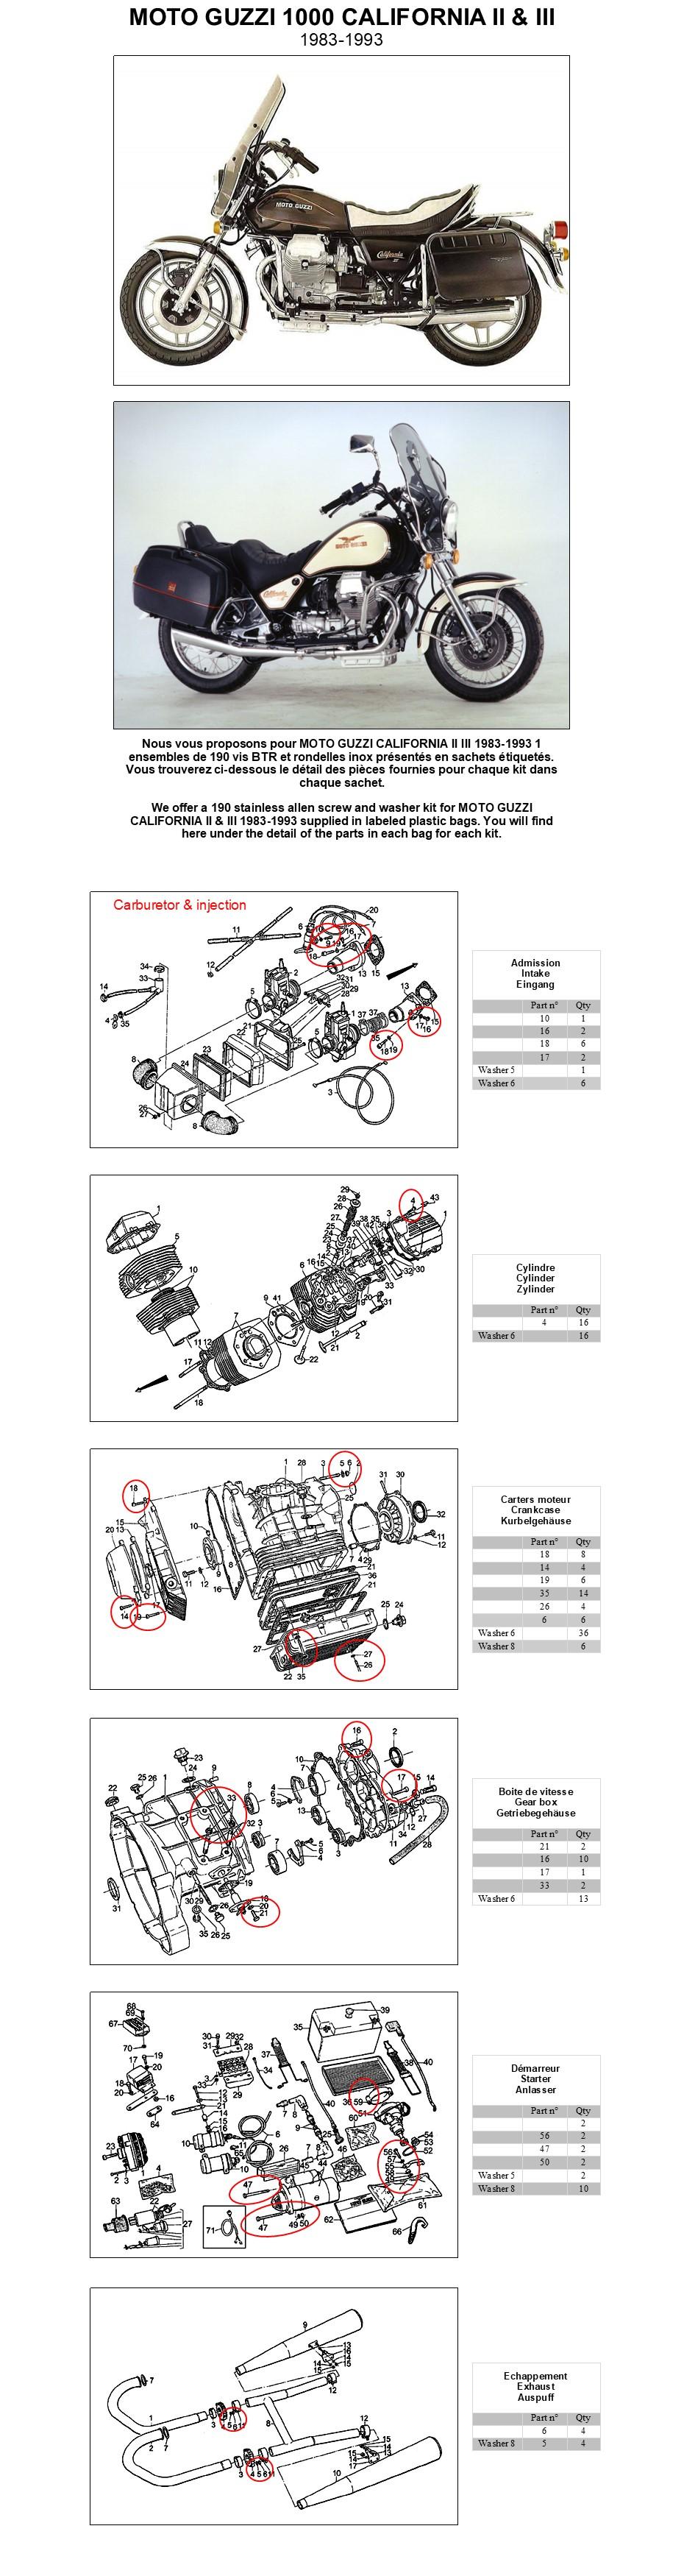 MOTO GUZZI 1000 STRADA 1993-1994 Kit vis BTR inox moteur complet